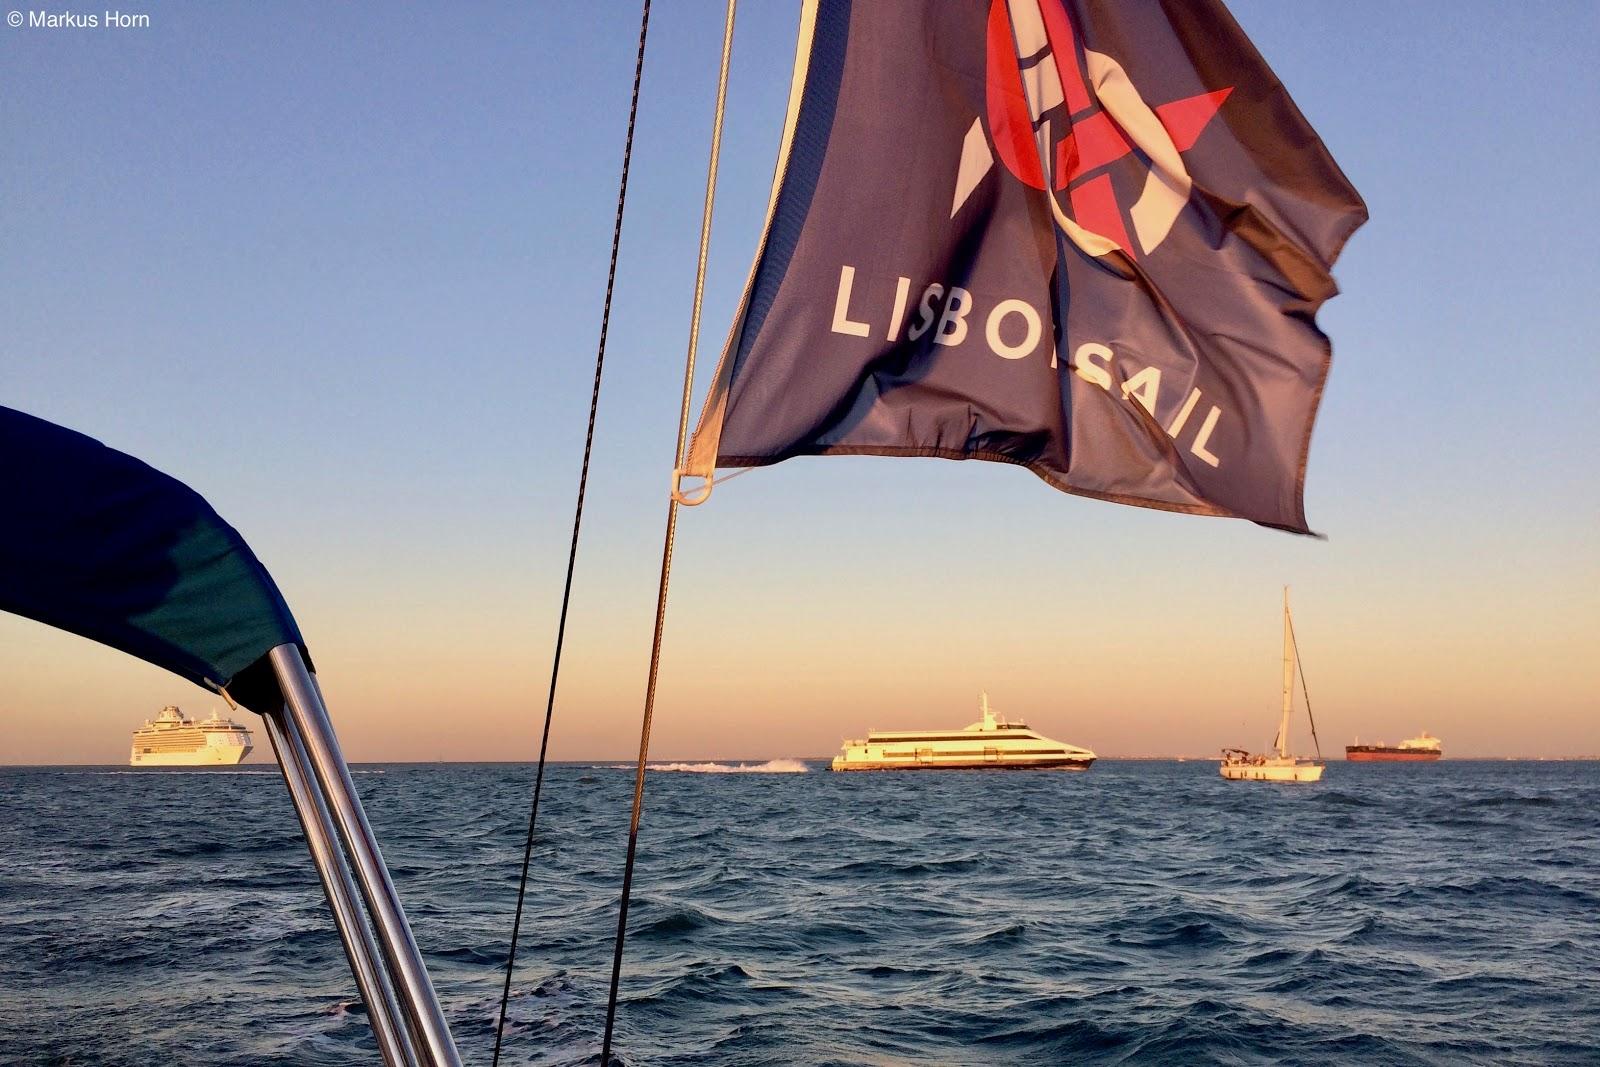 Lisbon Sail 12